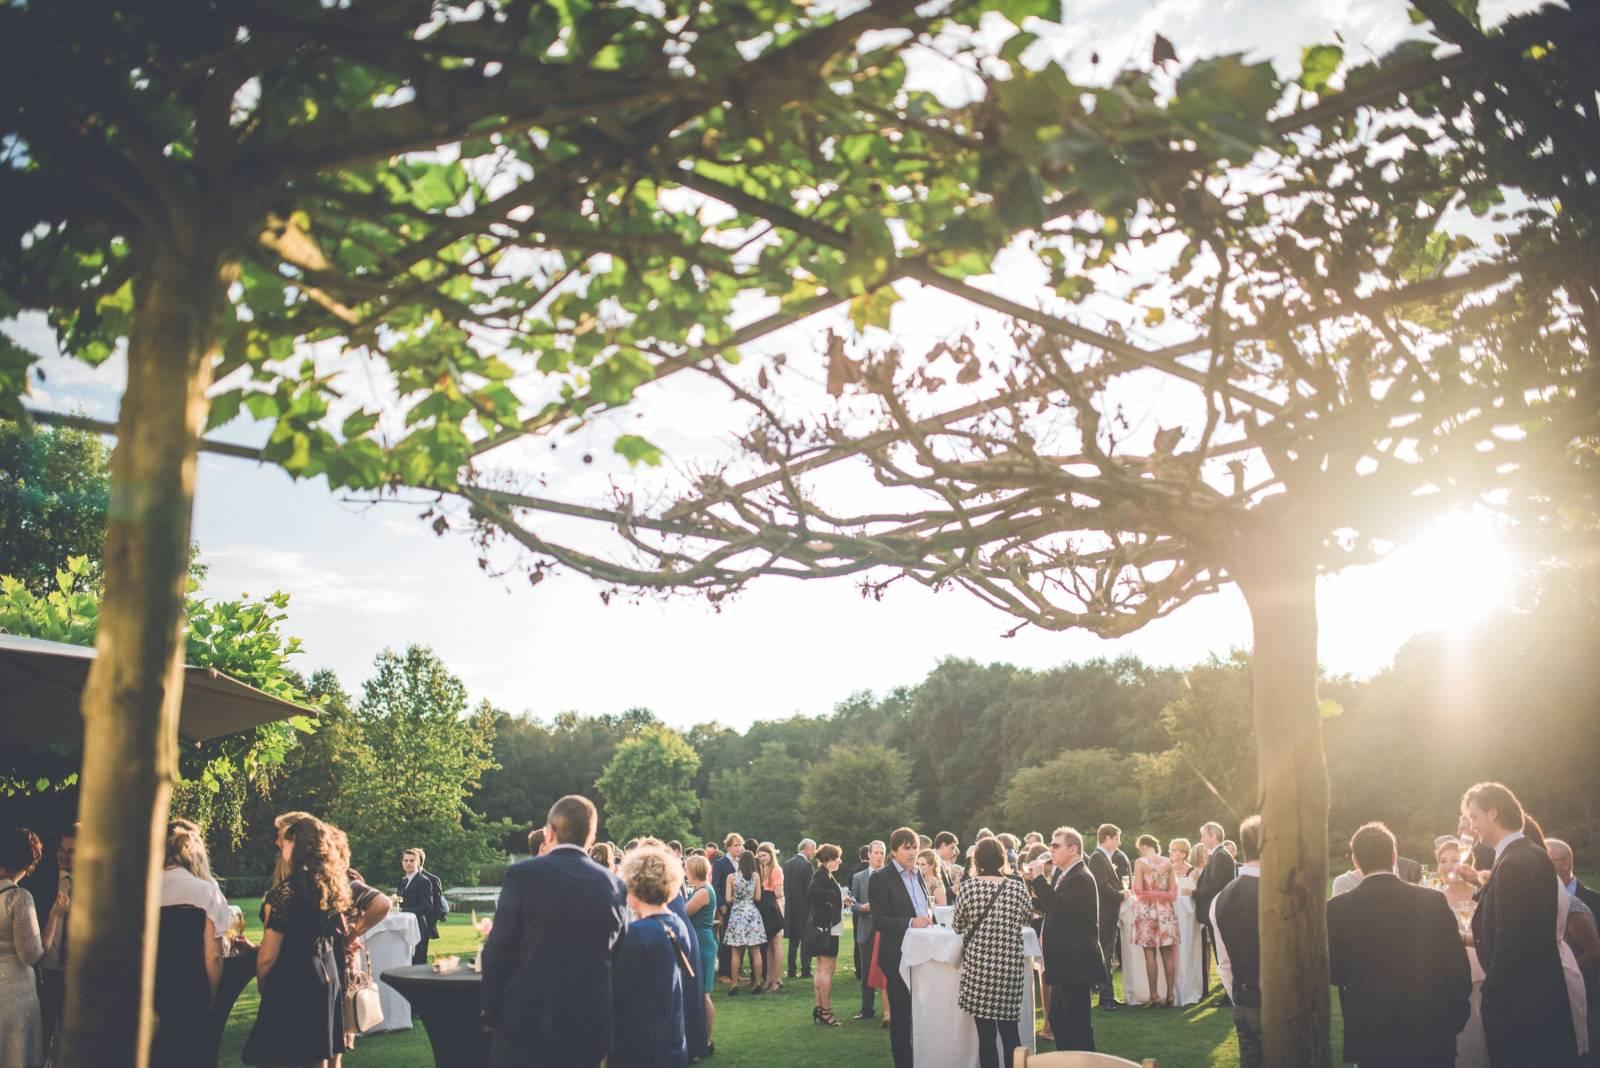 De Barrier - Feestzaal -  House of Weddings - 24